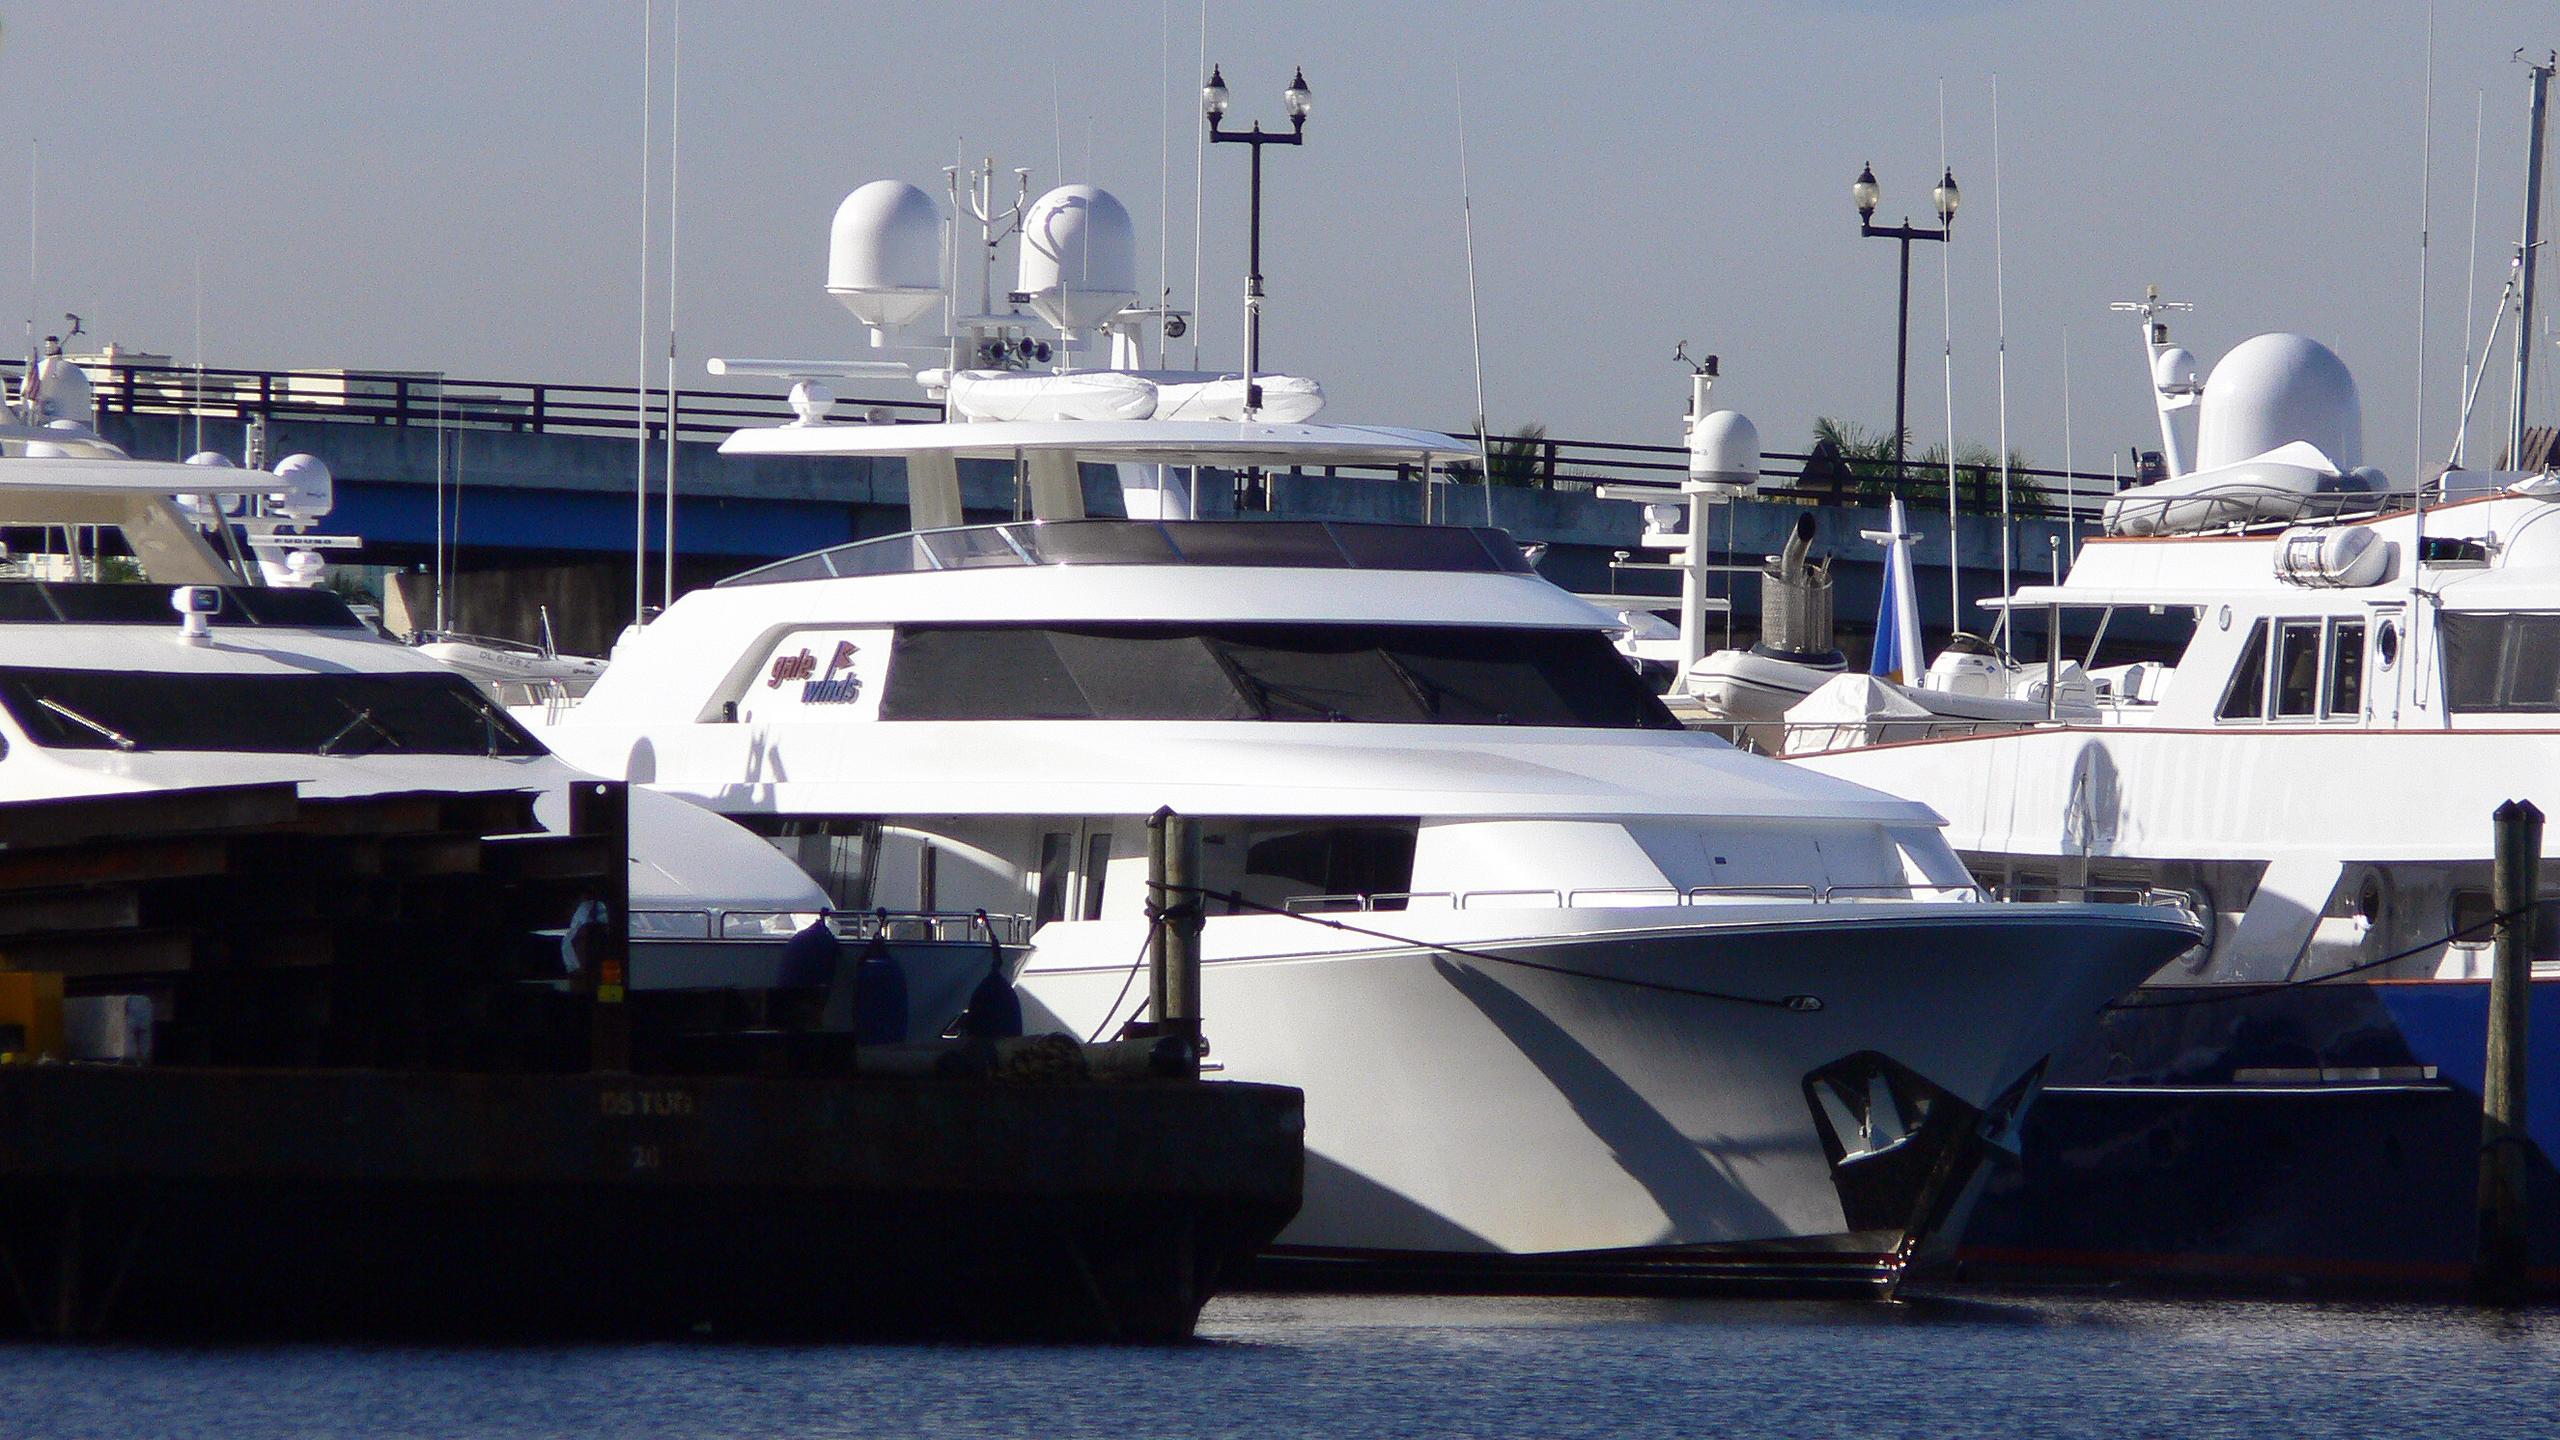 dream-weaver-motor-yacht-westport-112-2005-34m-half-profile